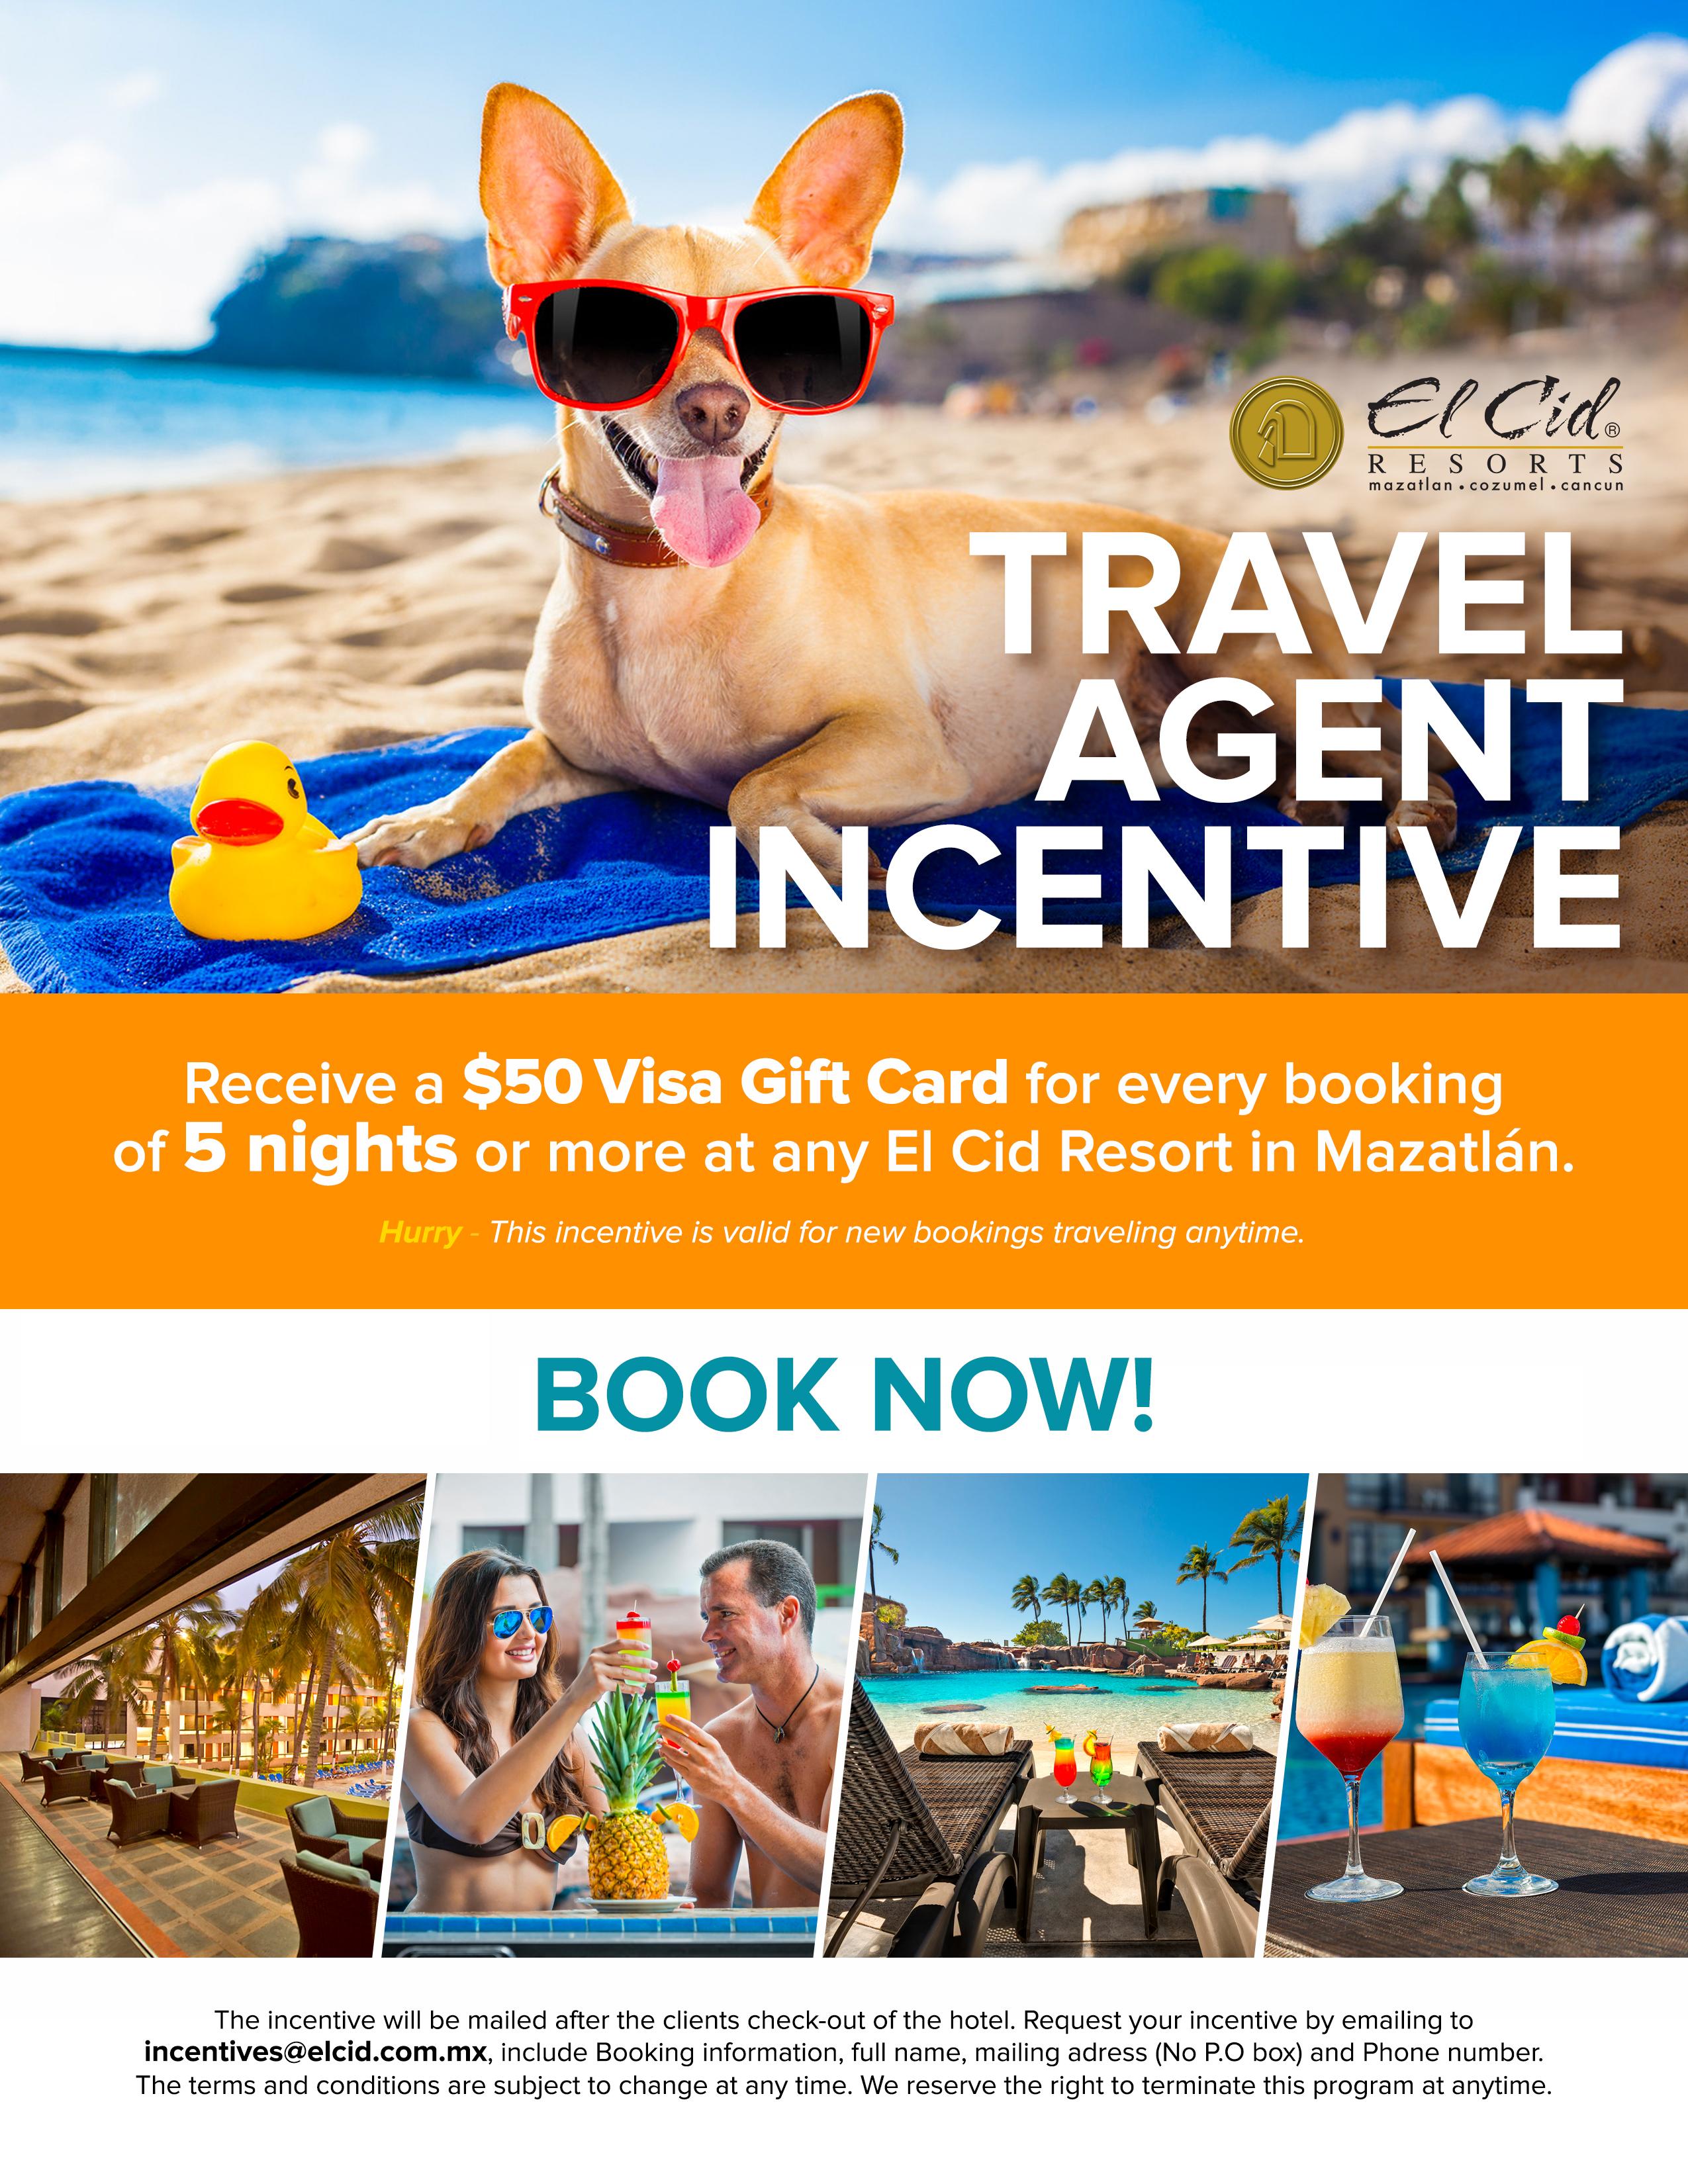 http://www.daemery.com/detm/promotions/ElCid/2019_El-Cid-$50-Visa-Gift-Card-Mar-26-2019.jpg